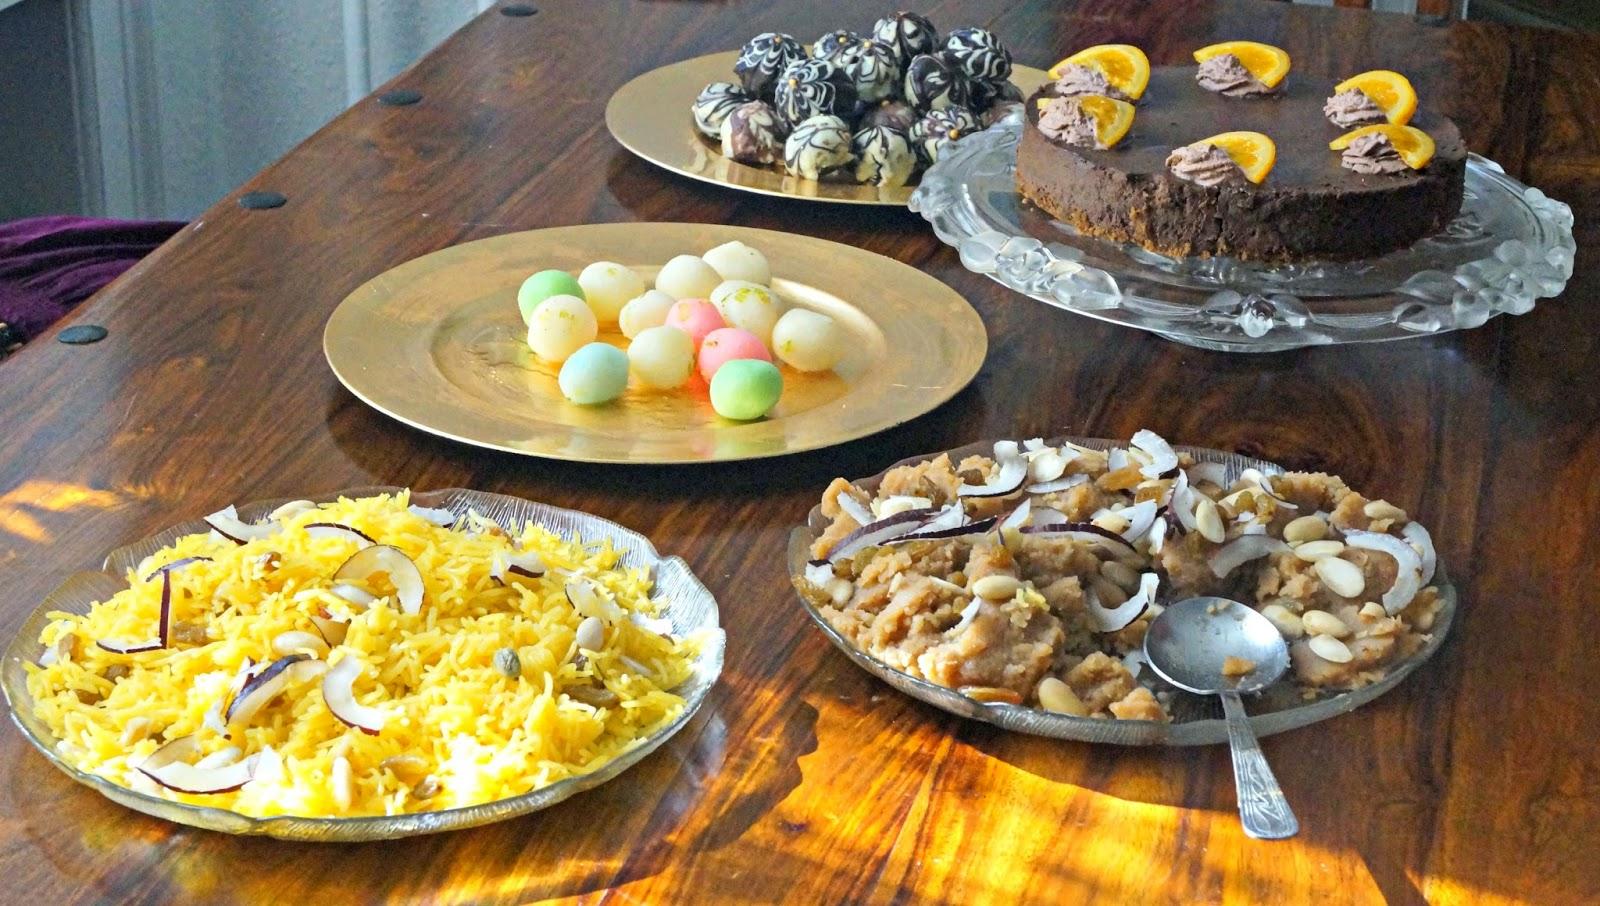 http://cupcakeluvs.blogspot.dk/2014/10/double-chocolate-orange-cheesecake.html